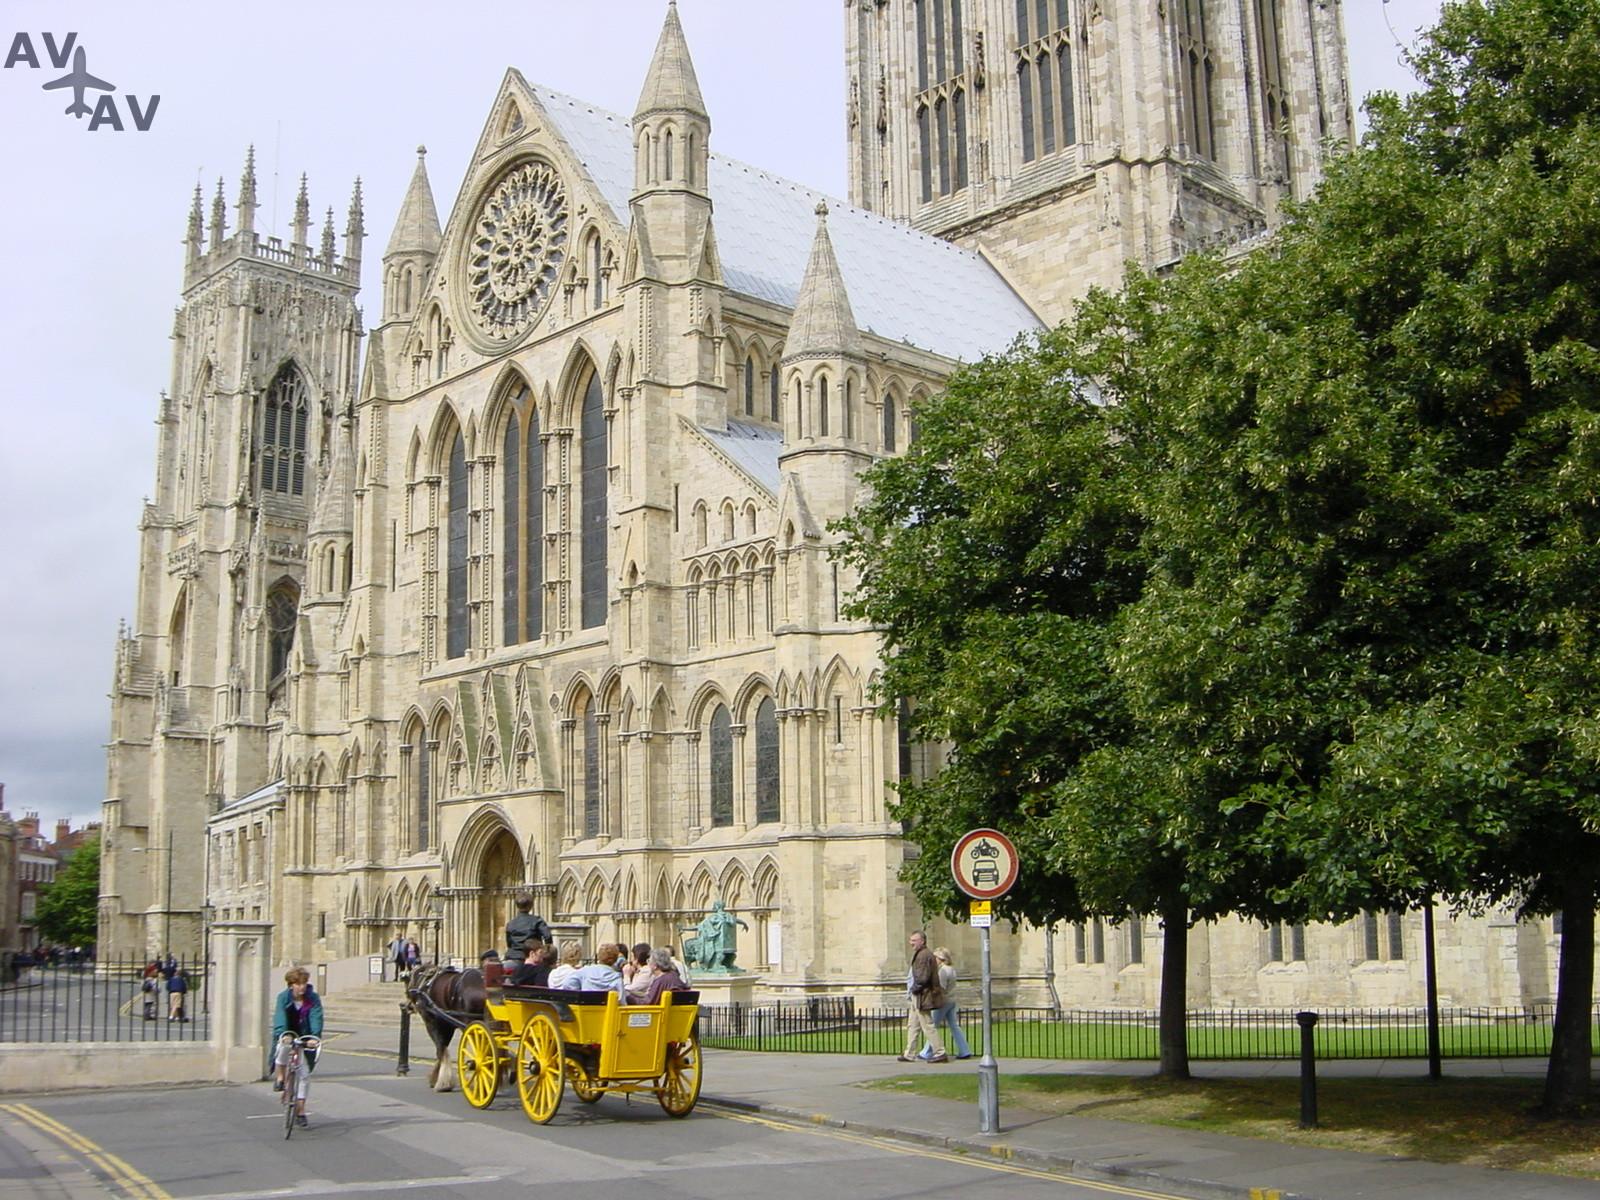 York istoricheskiy tsentr Severnoy Anglii - Йорк - исторический центр Северной Англии